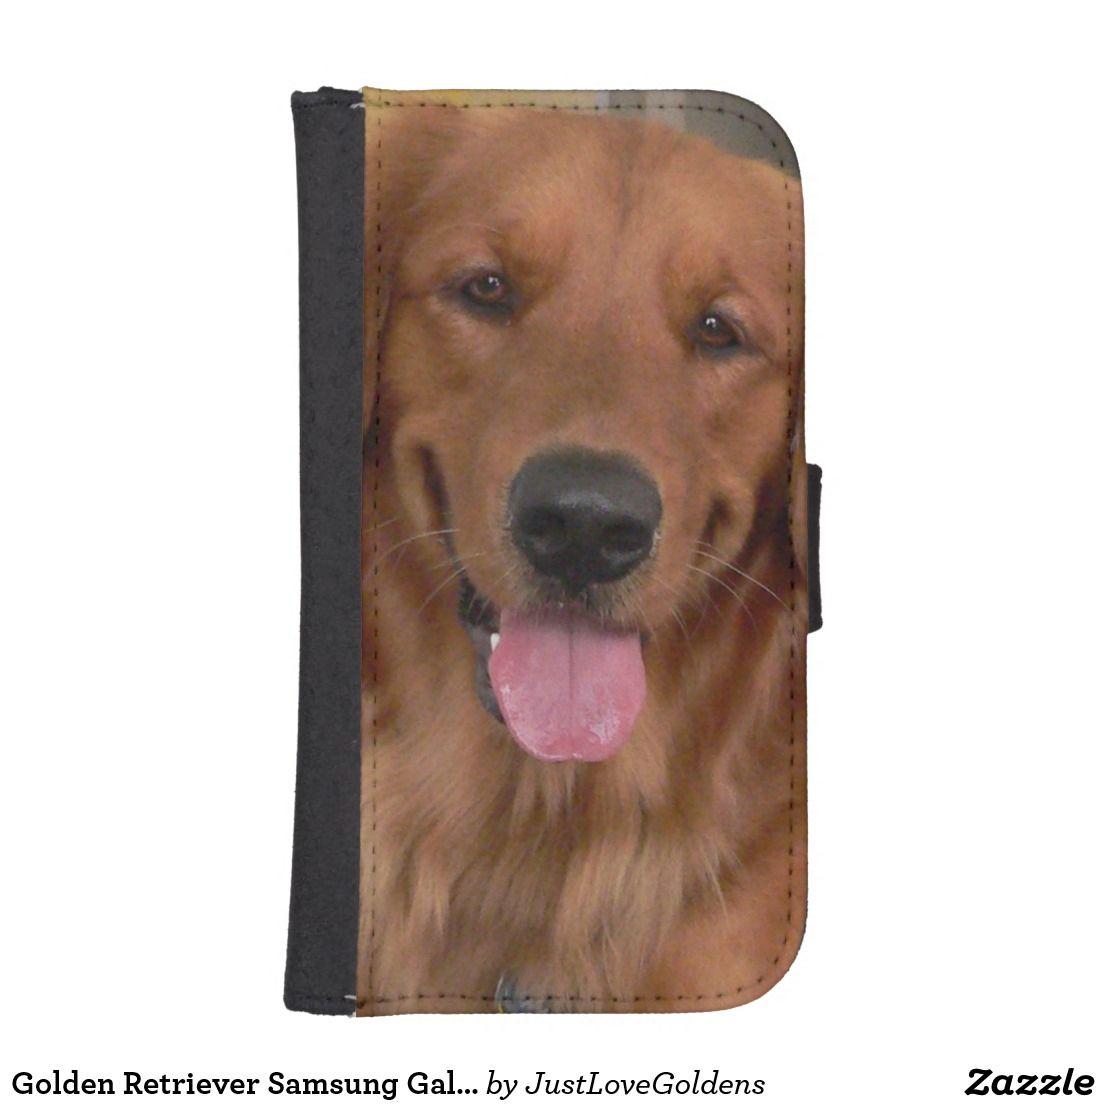 Golden retriever samsung galaxy phone wallet case zazzle